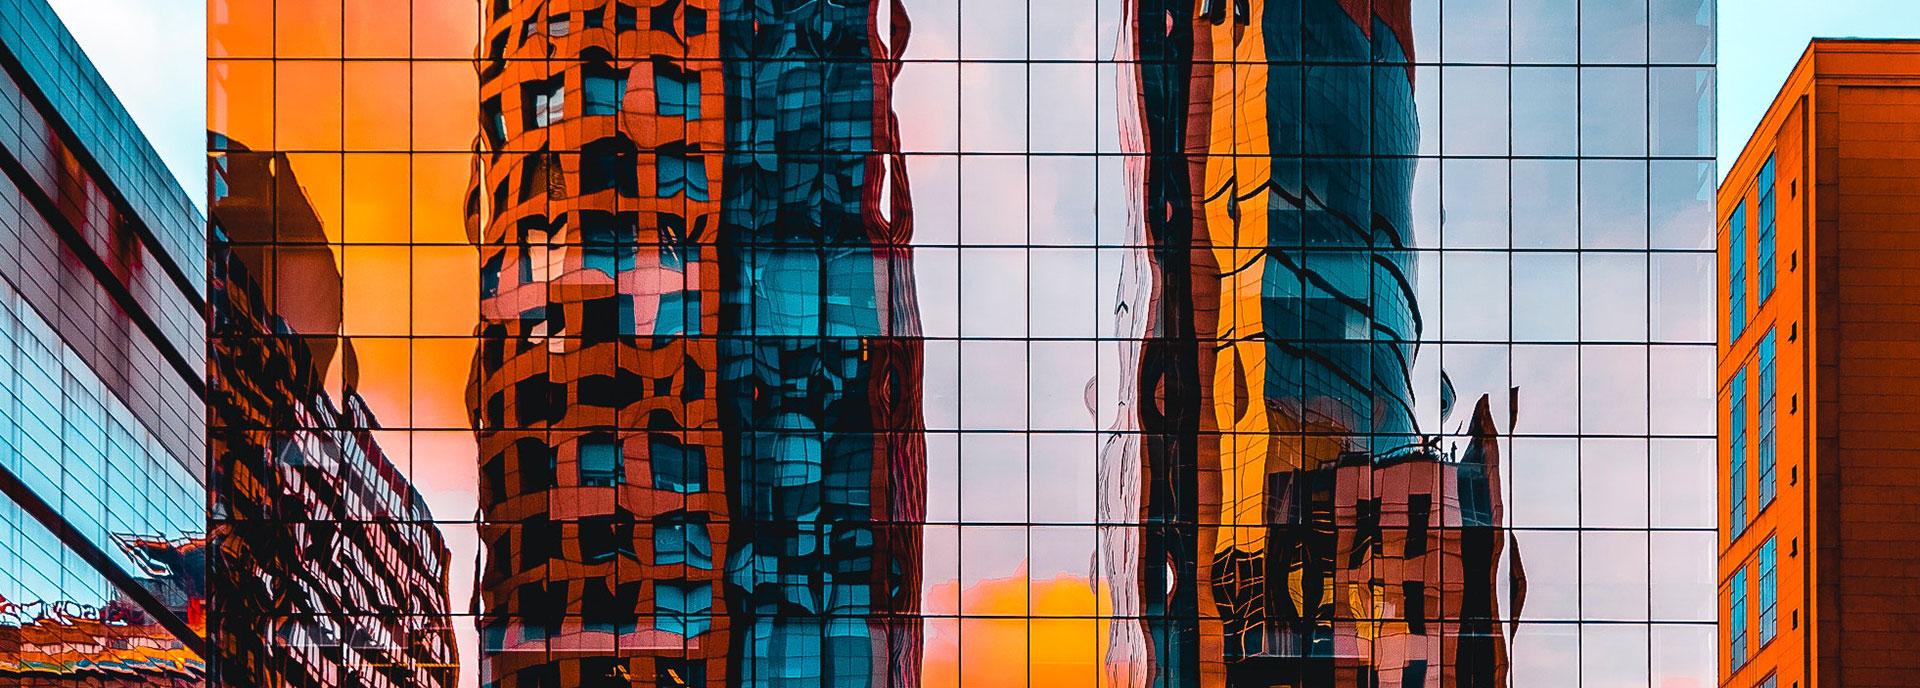 full_width_buildings_image